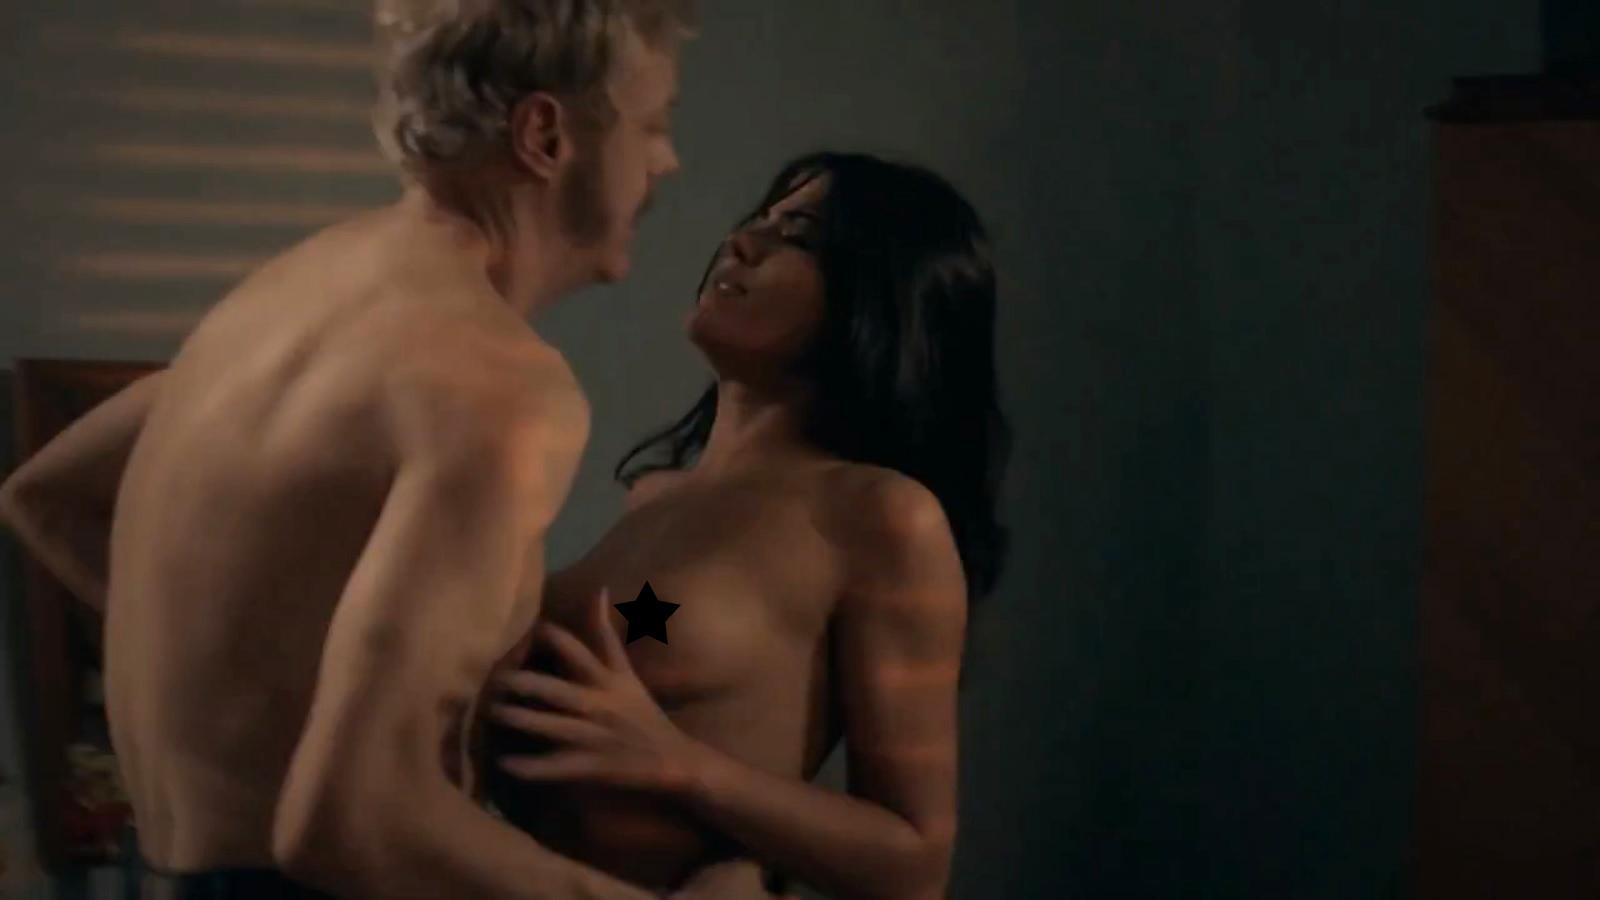 video sexo forte filmes eroticos portugueses